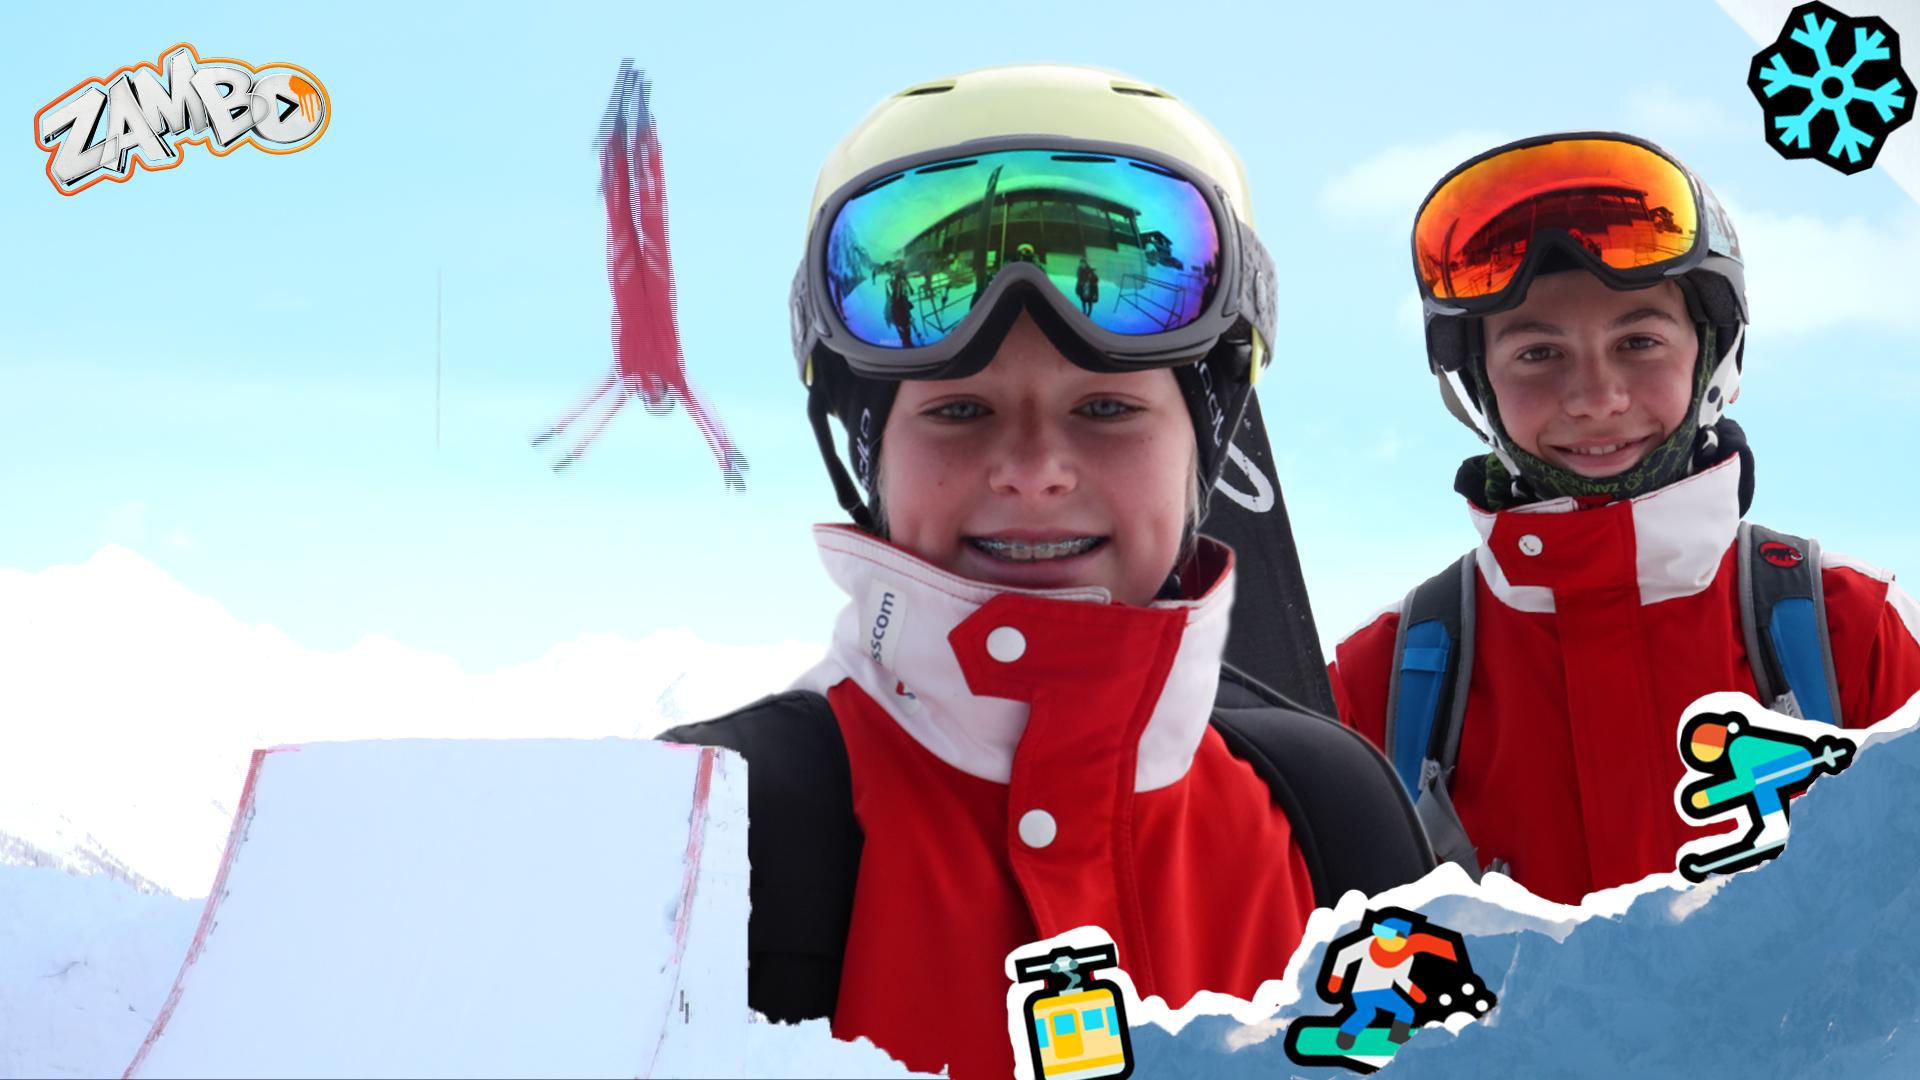 Ursina und Fabian, die Ski-Aerial-Profis